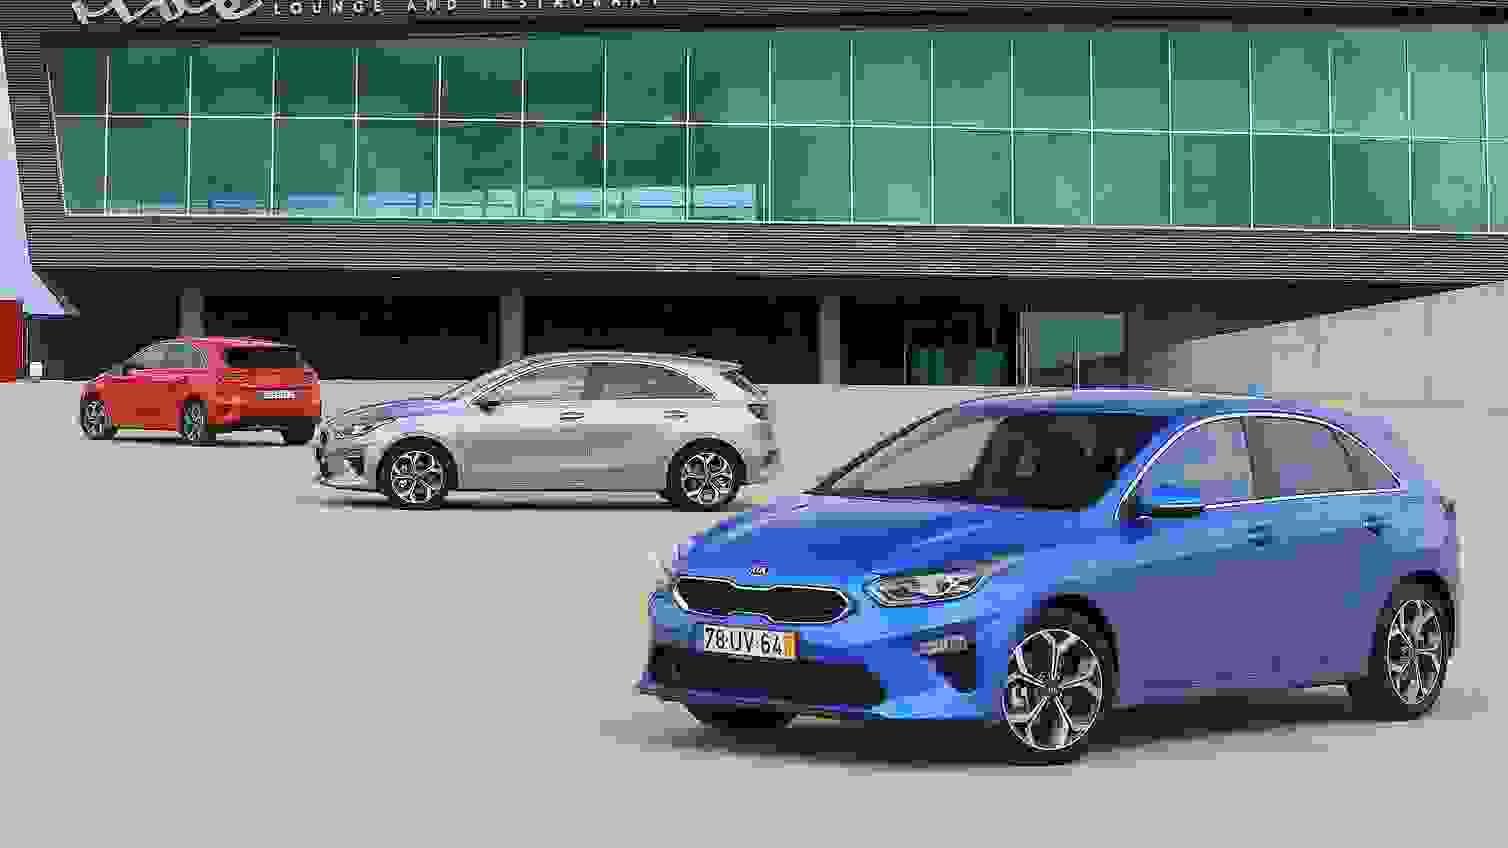 Kia Ceed 2019 1600 4C